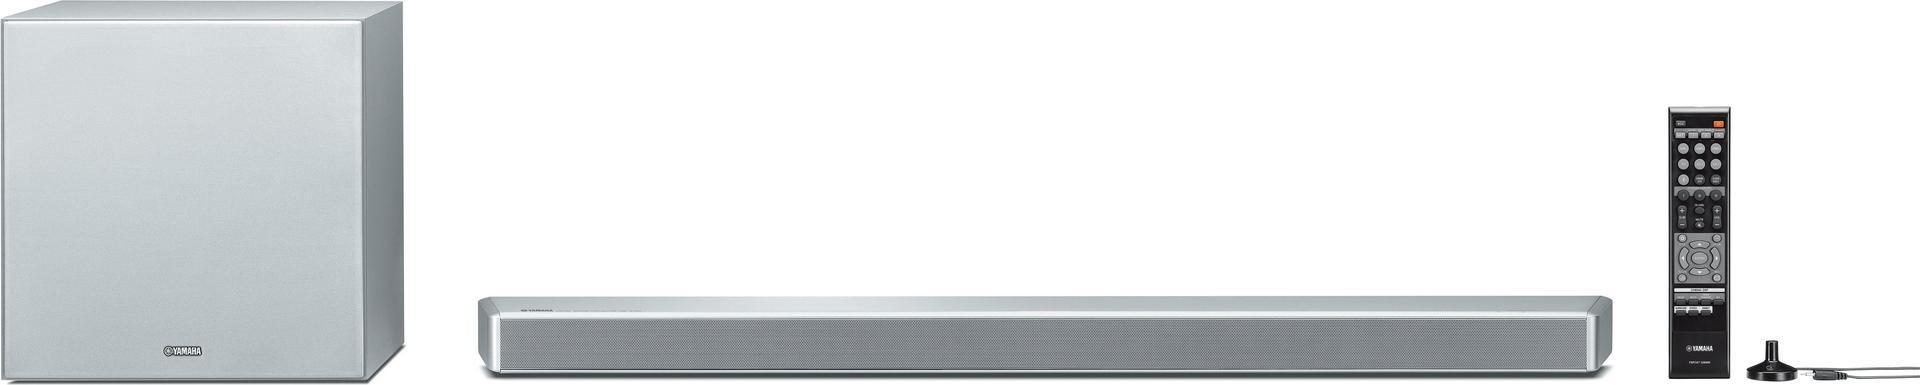 Heimkino Systeme - Yamaha MusicCast YSP 2700 7.1 Kanäle 107 W DTS,DTS 96 24,DTS Neo 6,DTS ES,DTS HD HR,DTS HD Master Audio,Dolby Digital,Dolby Digital EX,Dolby... 24 W 14 cm 75 W (YSP 2700T)  - Onlineshop JACOB Elektronik